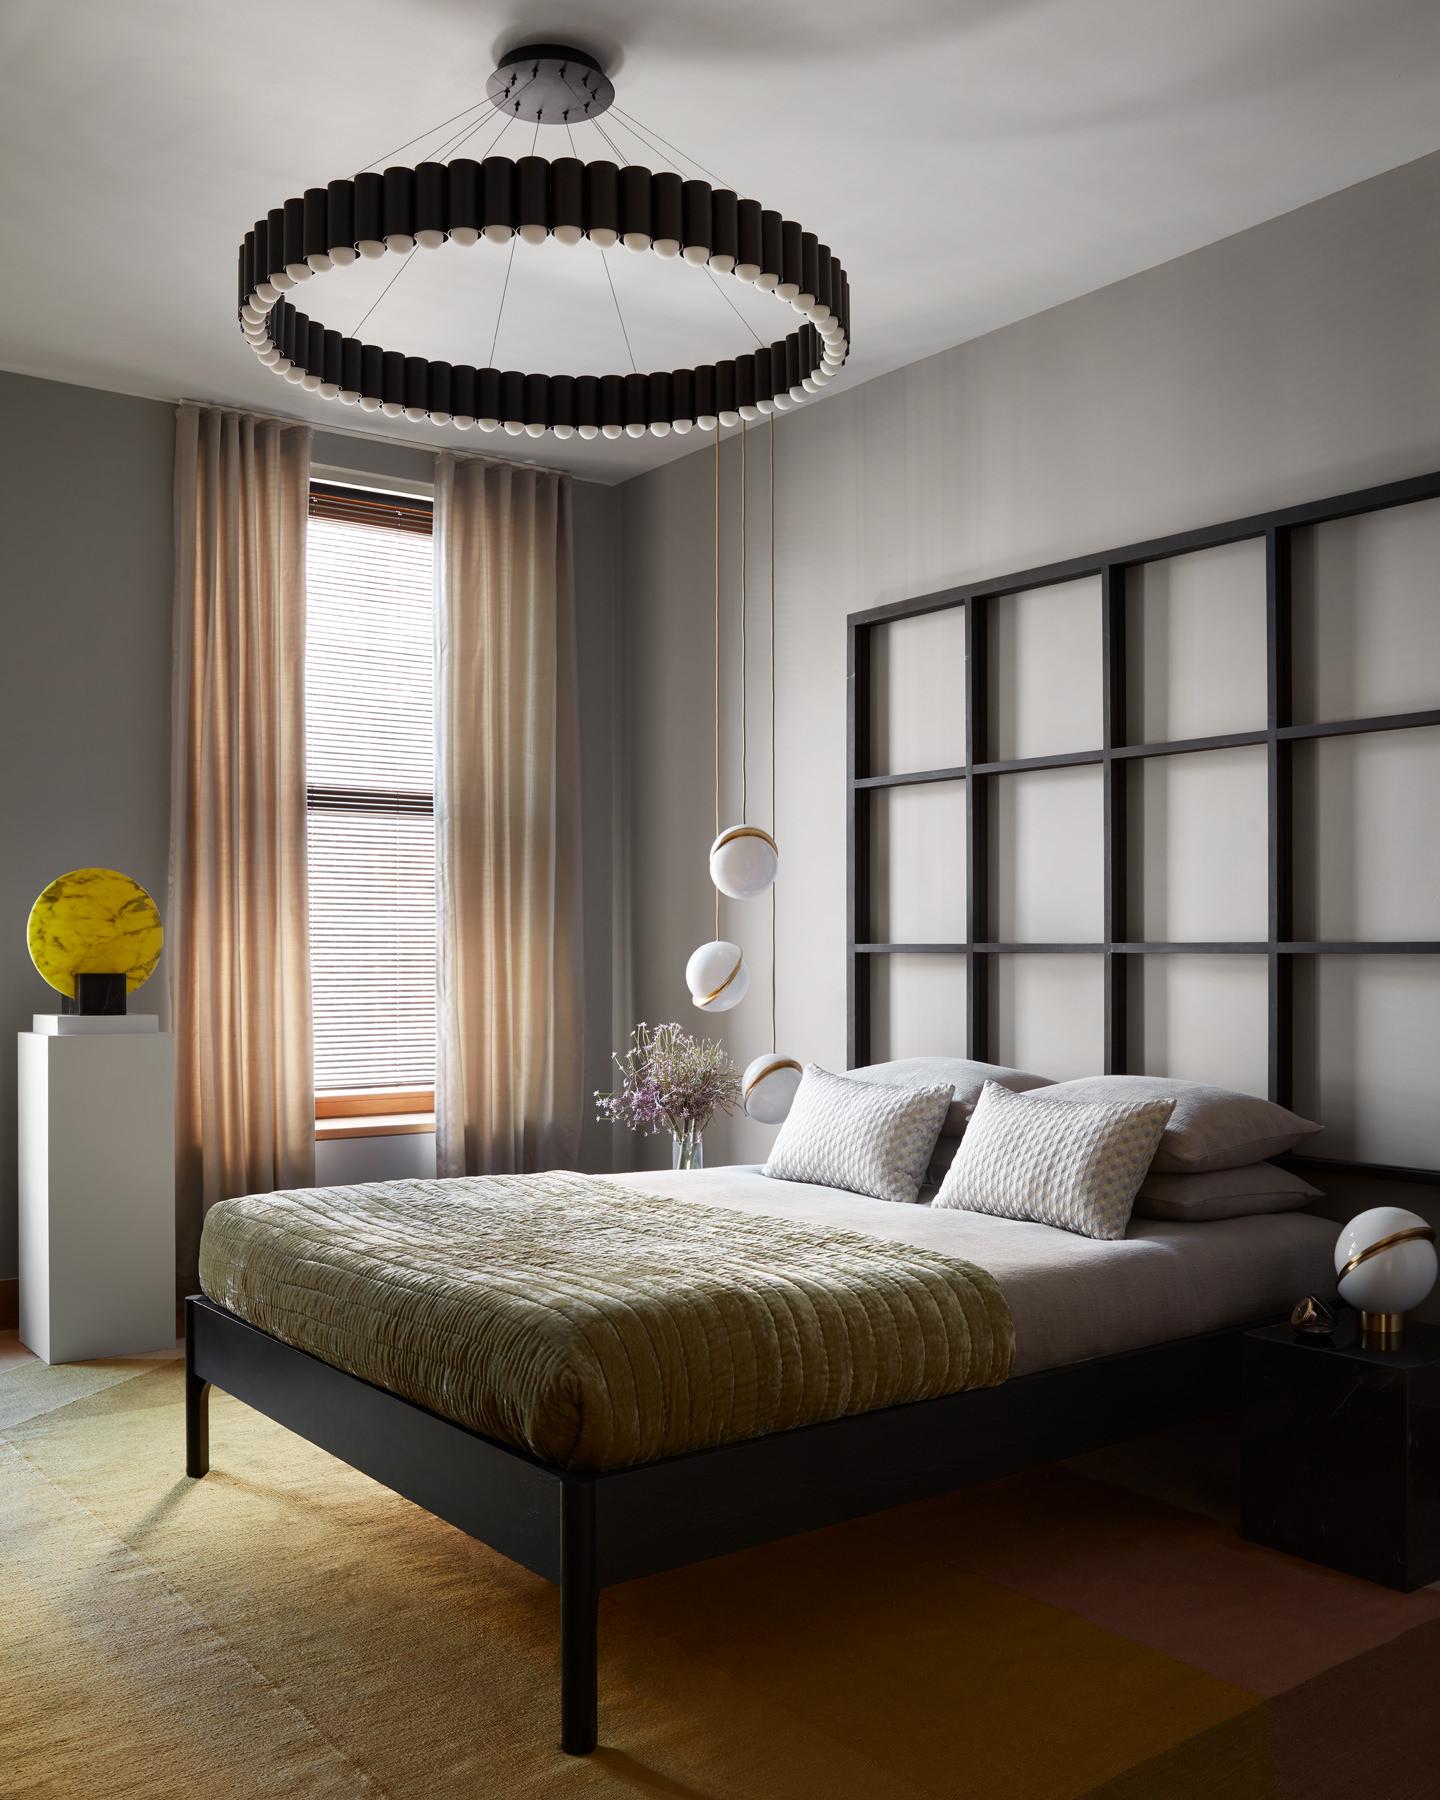 Lee Broom Penthouse New York Guest Bedroom Photo Stephen Kent Johnson Yellowtrace 21